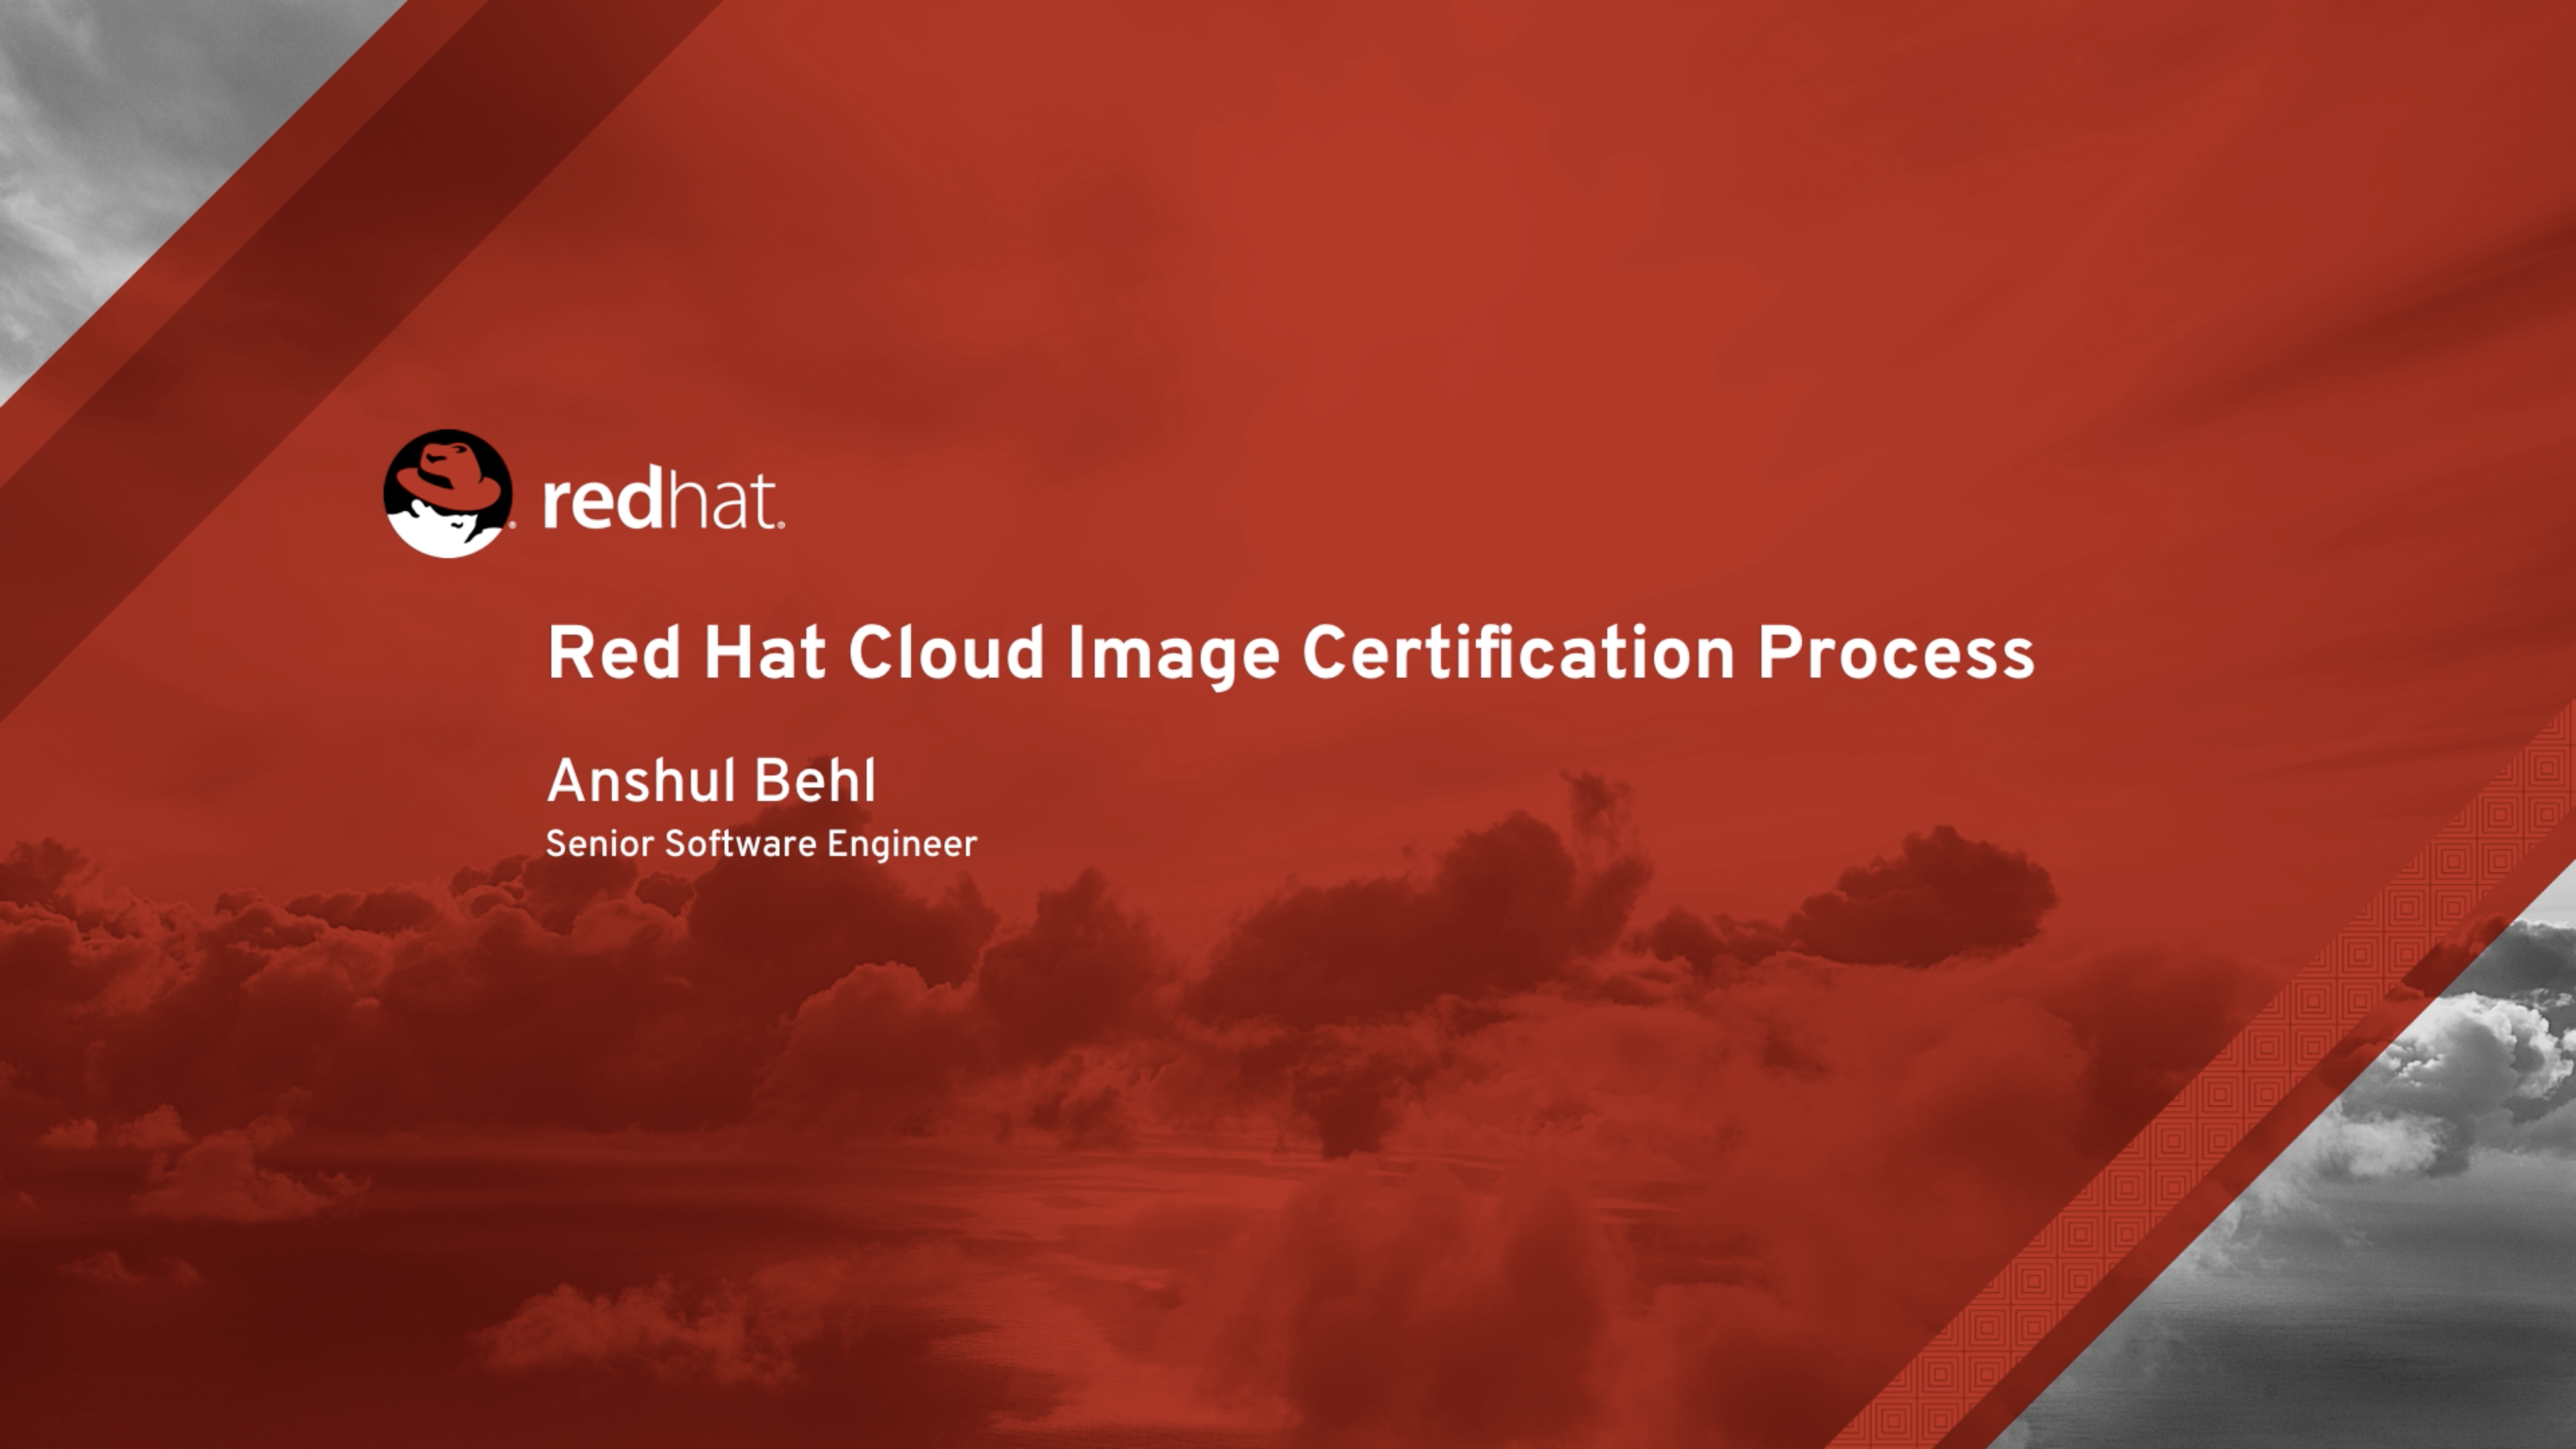 Red hat cloud image certification process red hat customer portal 0000 xflitez Images